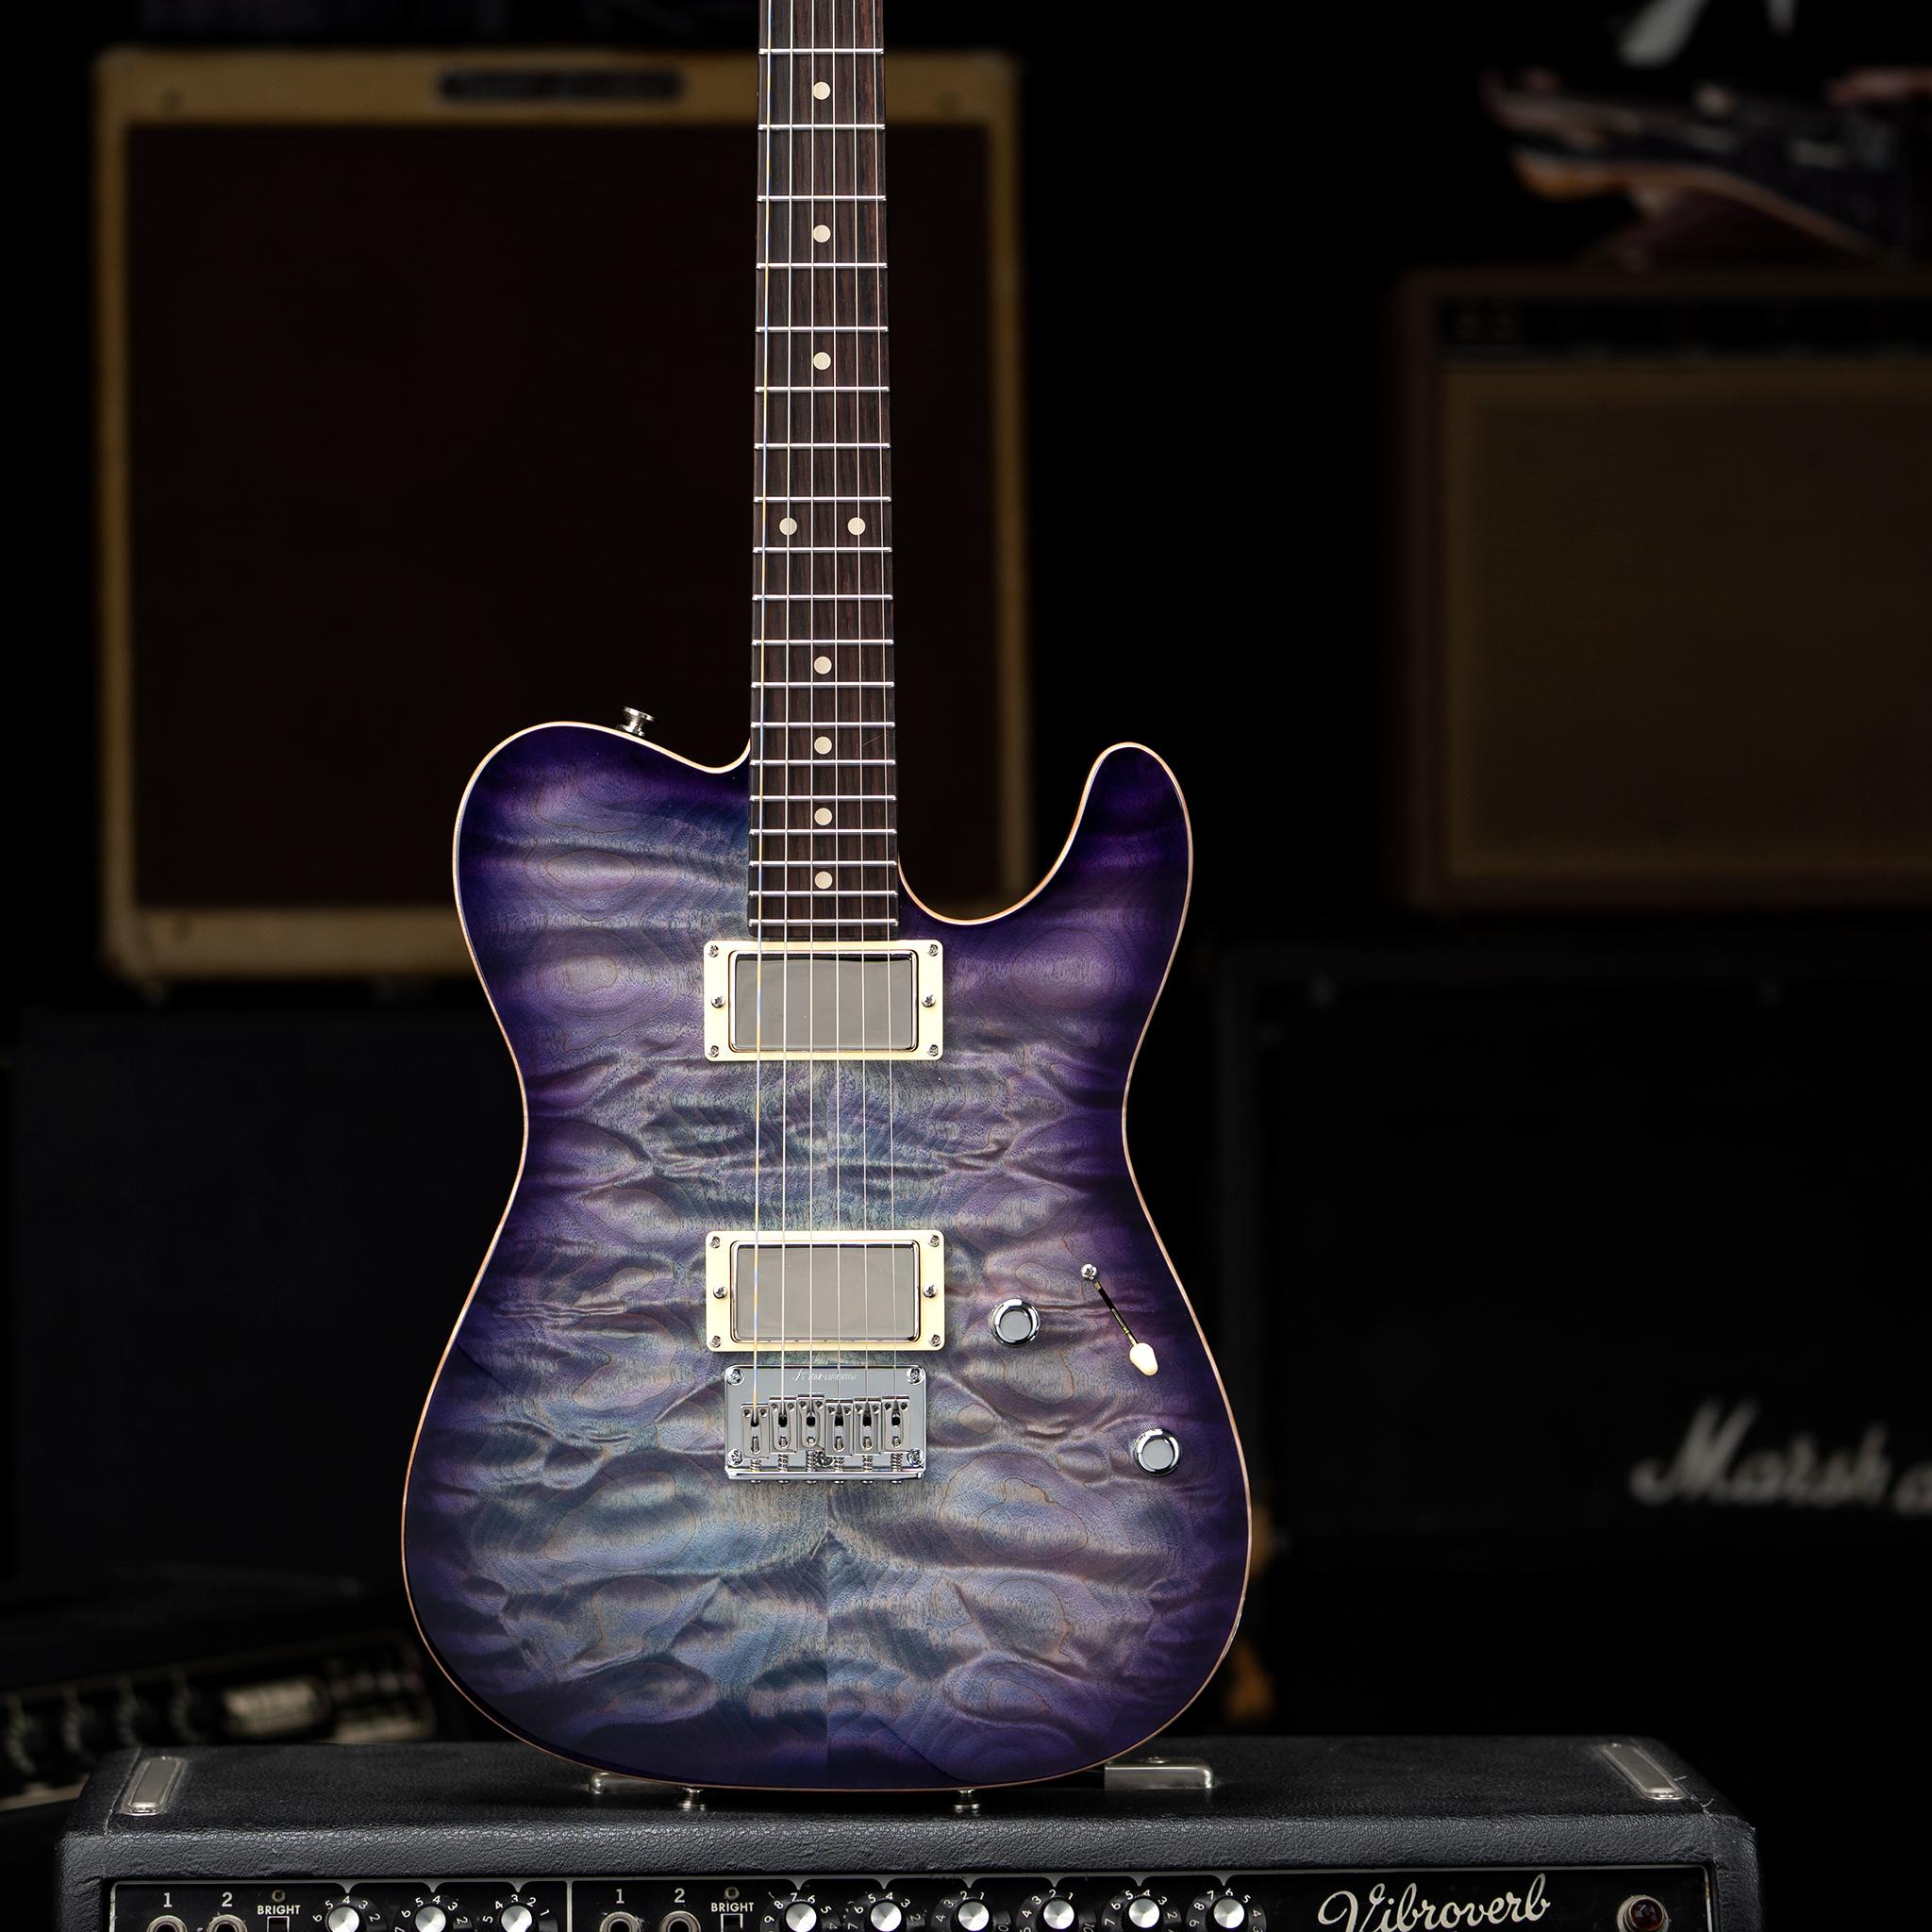 03-21-19P_bup_Cobra_Abalone to T-Purple Burst.jpg